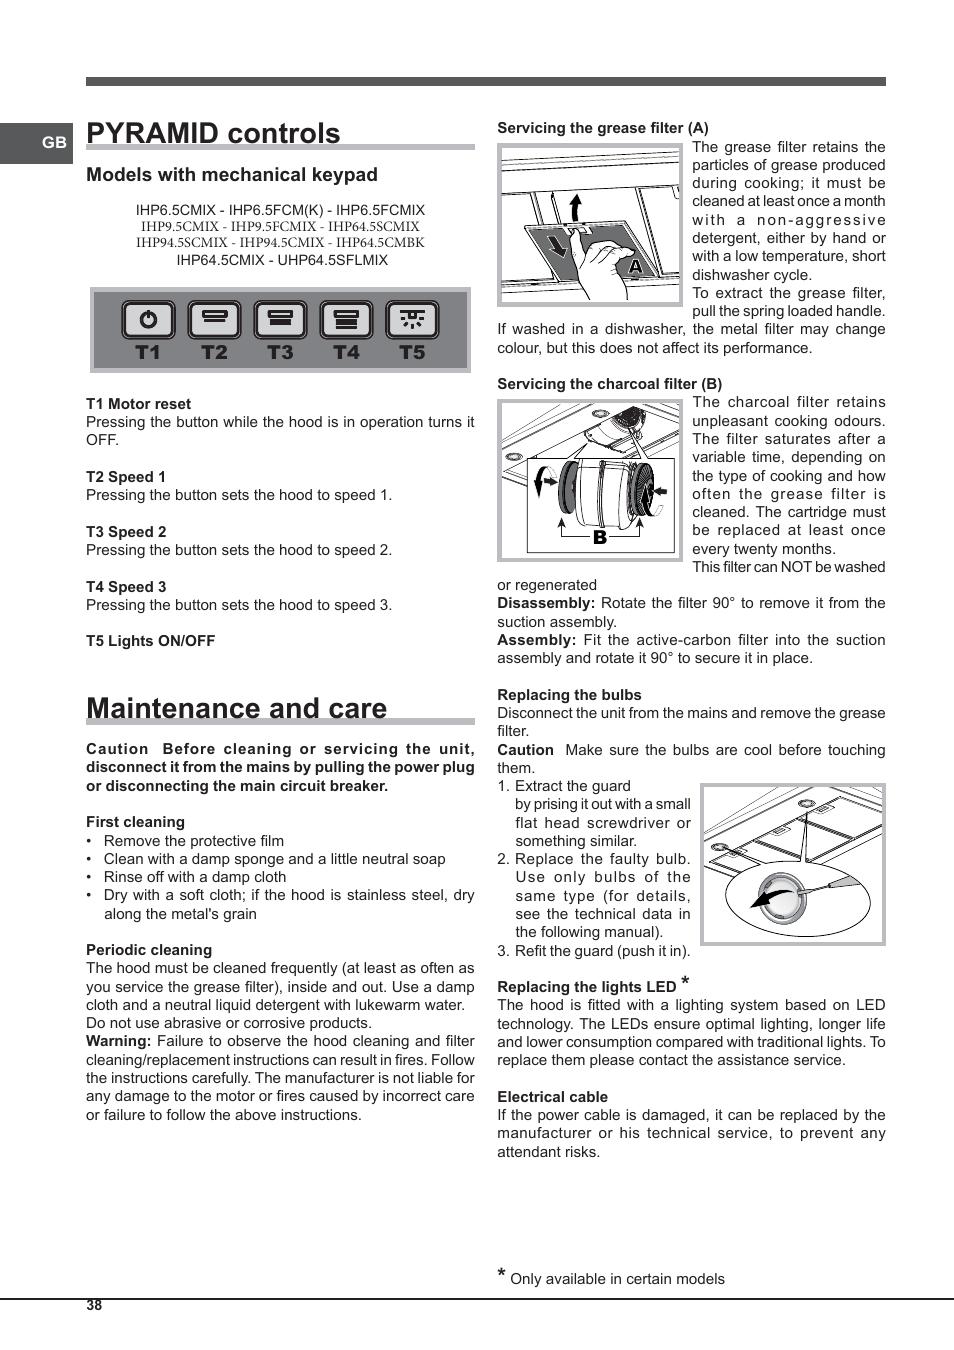 Pyramid controls, Maintenance and care   Indesit IHP-9.5-C-M-IX User